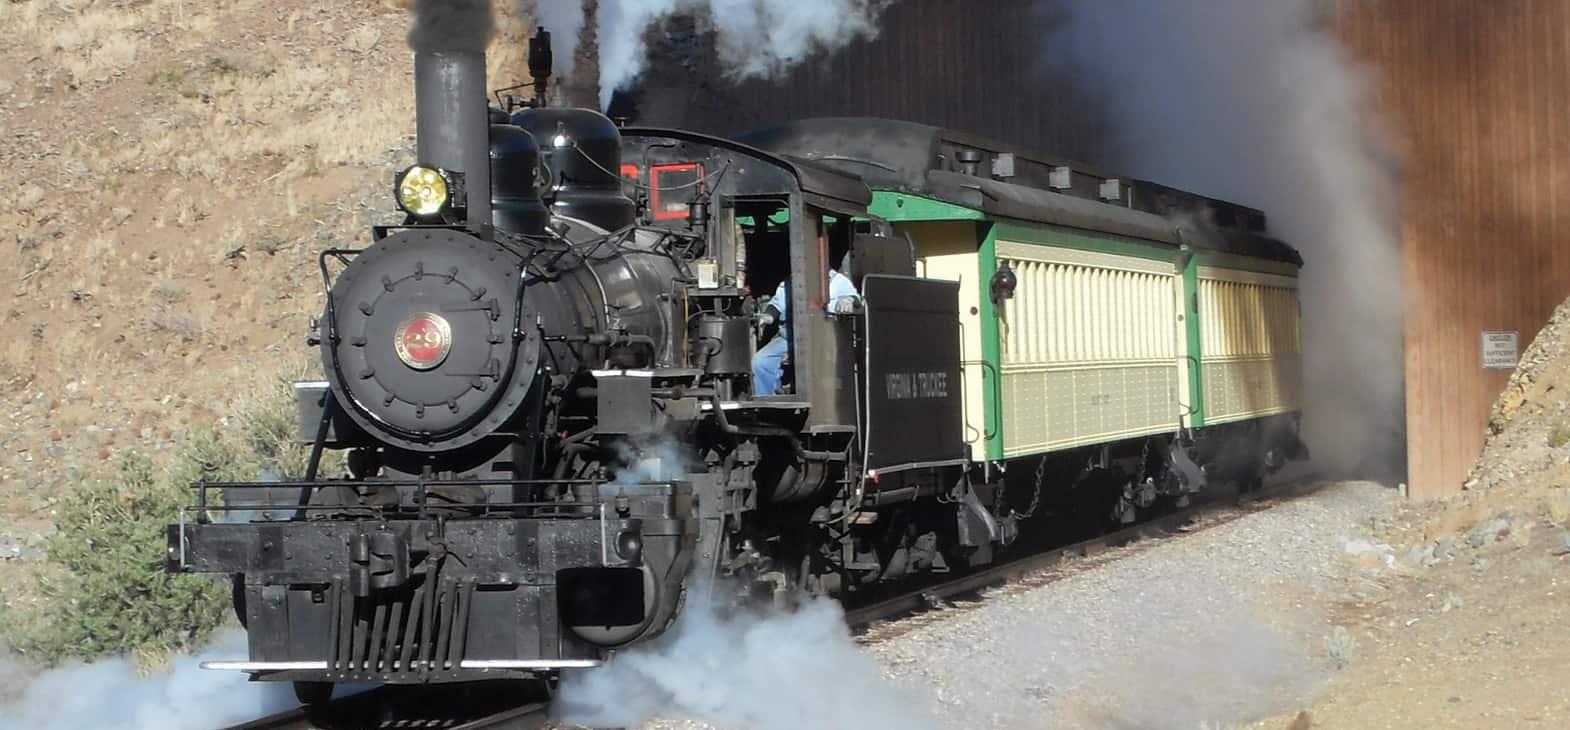 V&T Railway Virginia city to Gold hill Steam Train